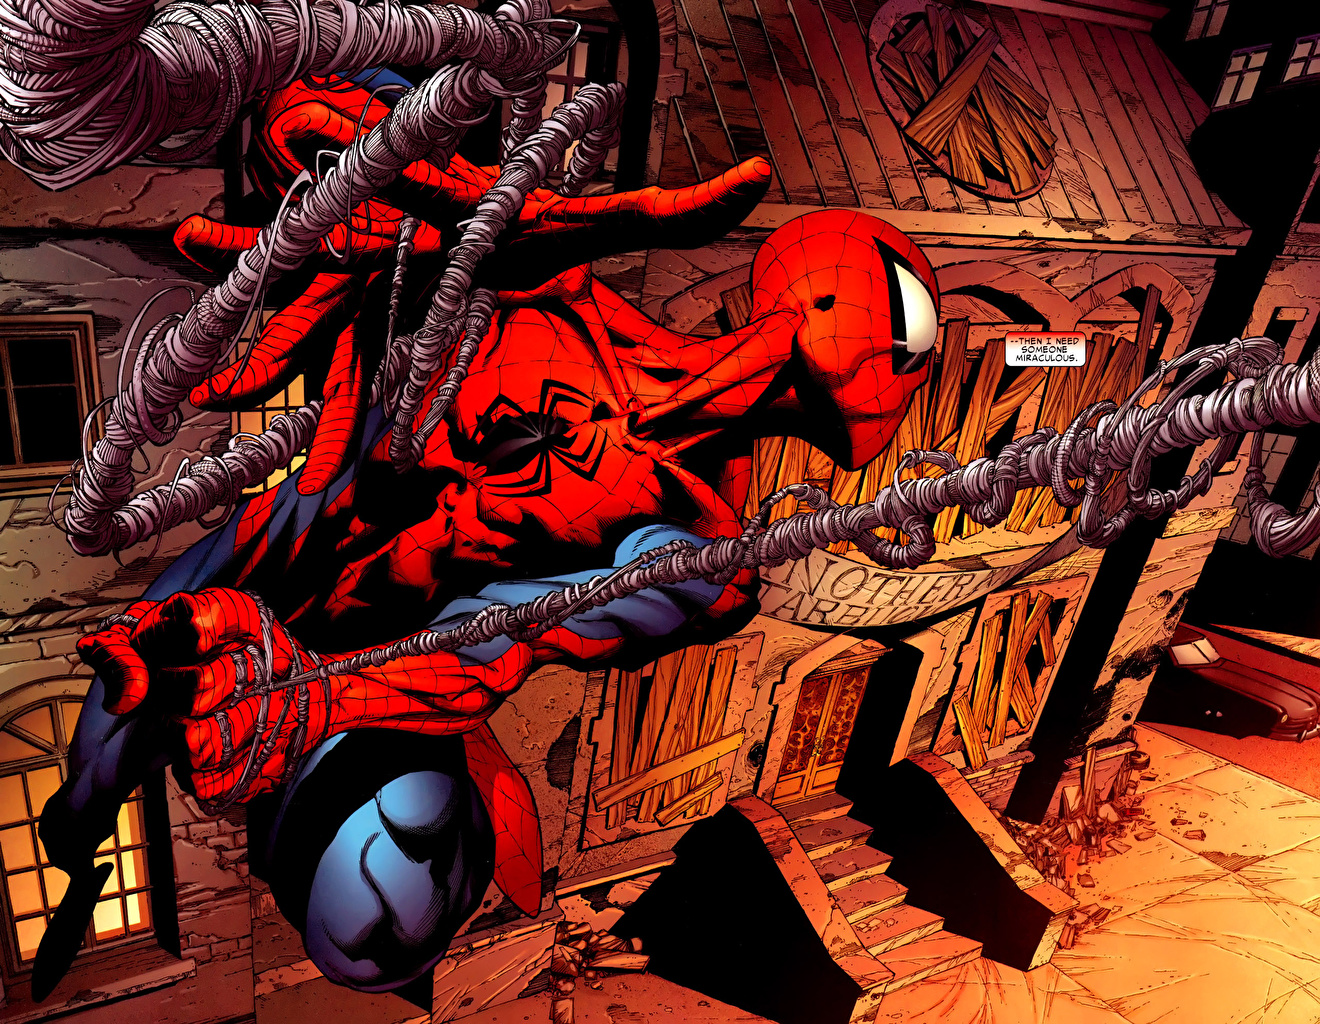 Tapety superbohaterów Spider-Man superbohater Fantasy Bohaterowie komiksów